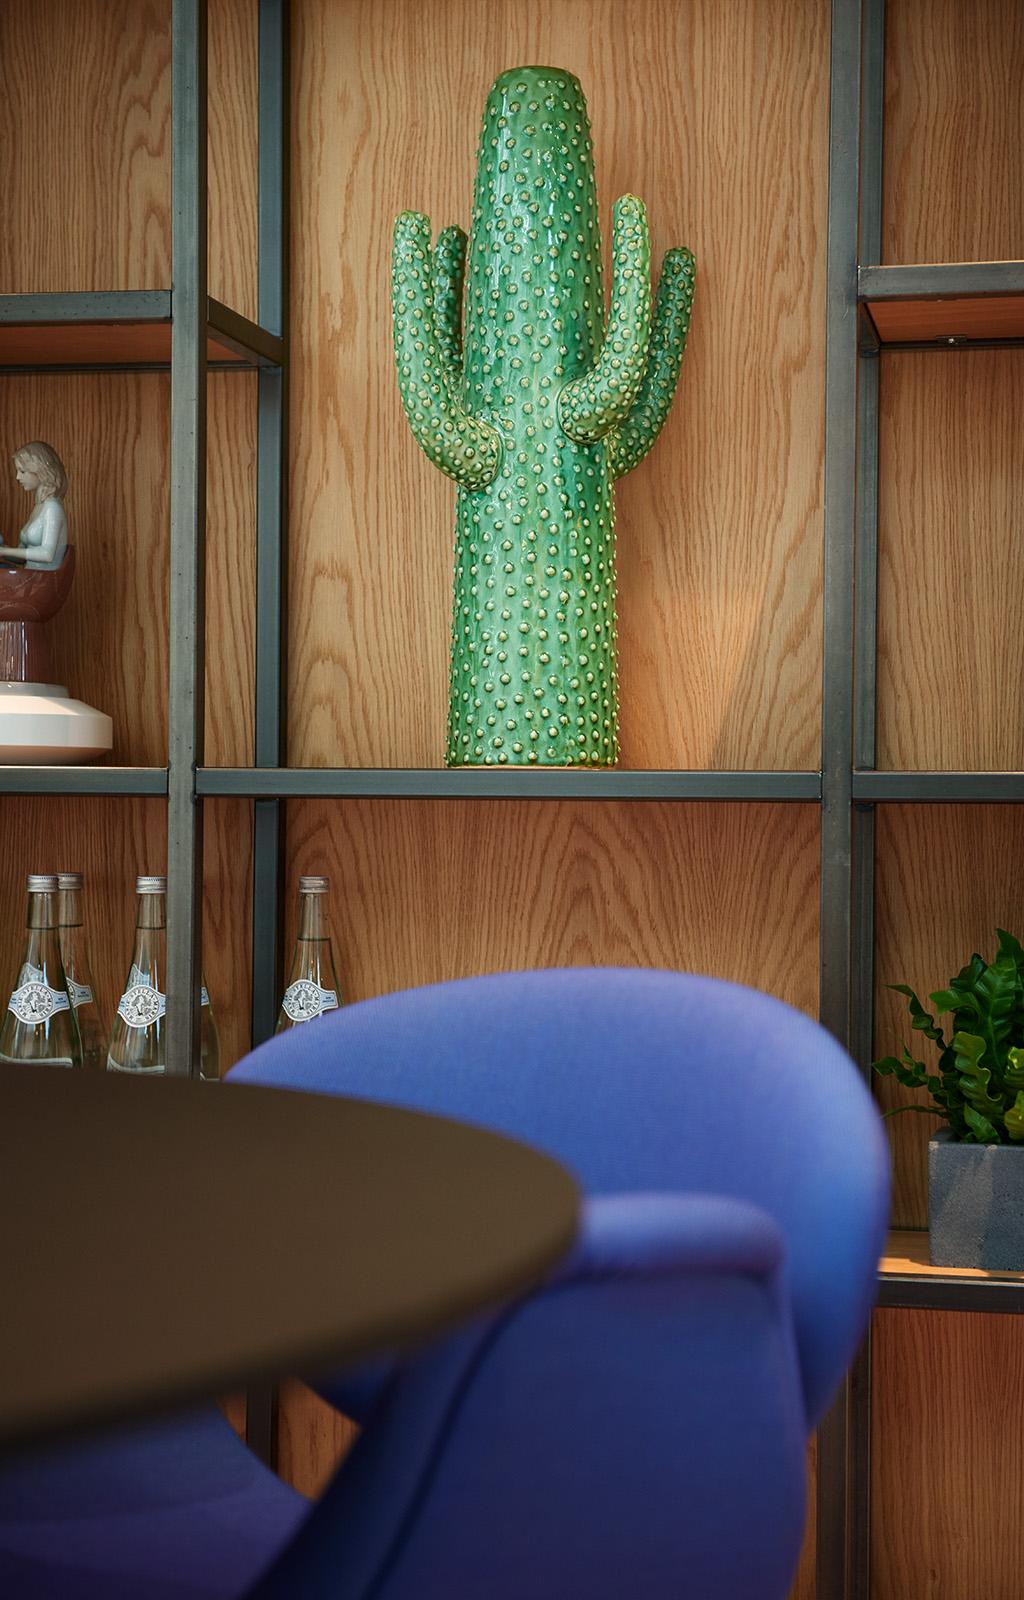 Creneau Interior Design Agency Dubai Middle East ING Bank Details